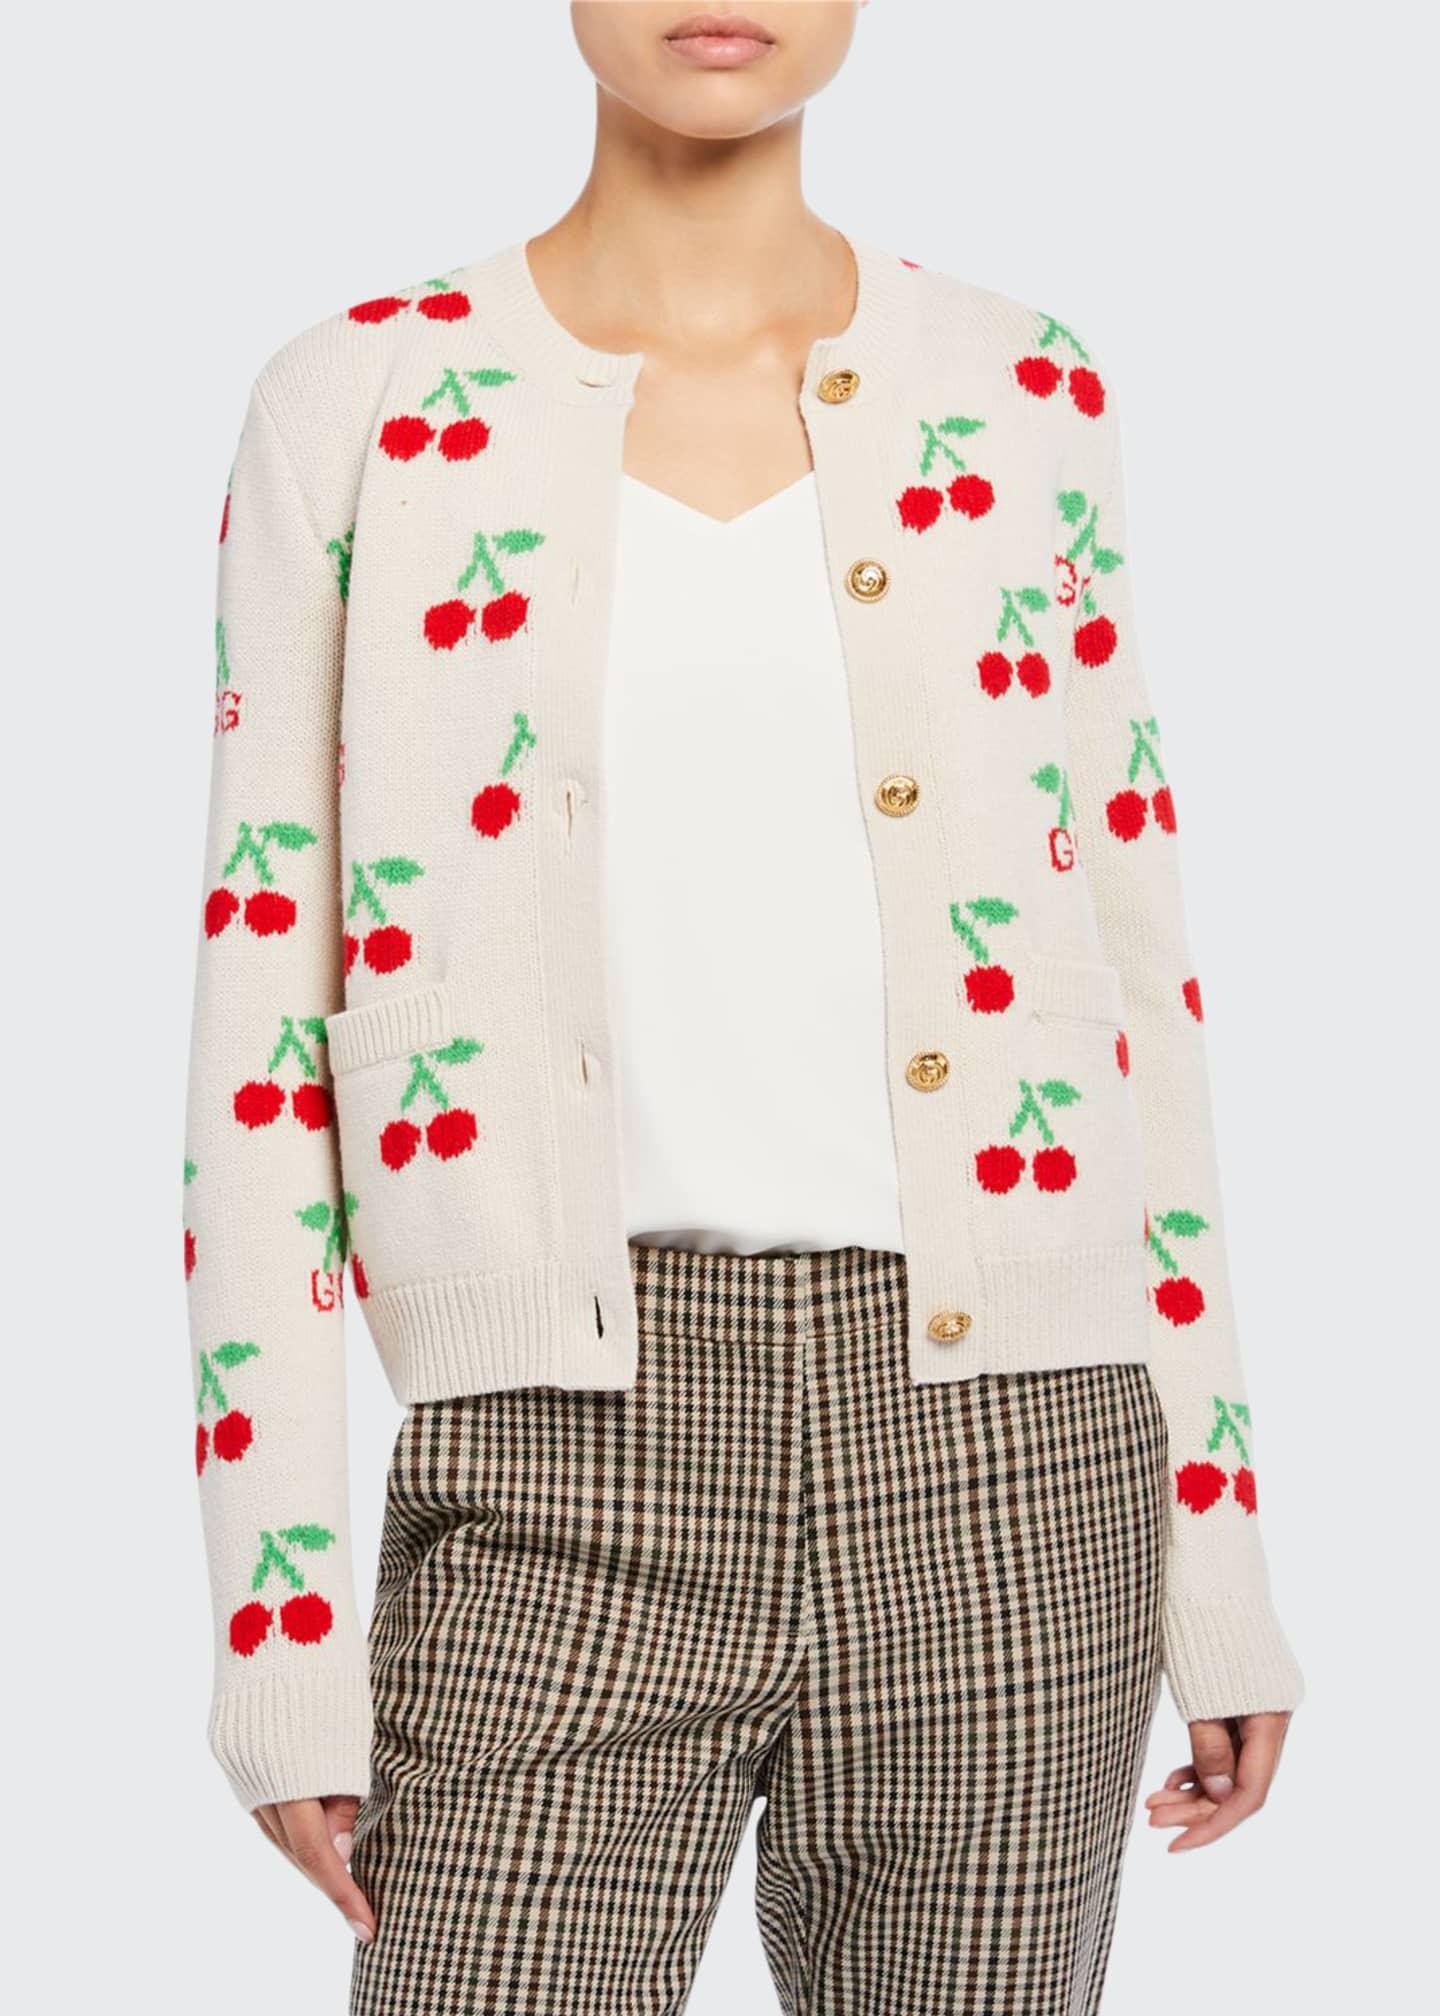 Gucci Cherry Jacquard Wool Cardigan